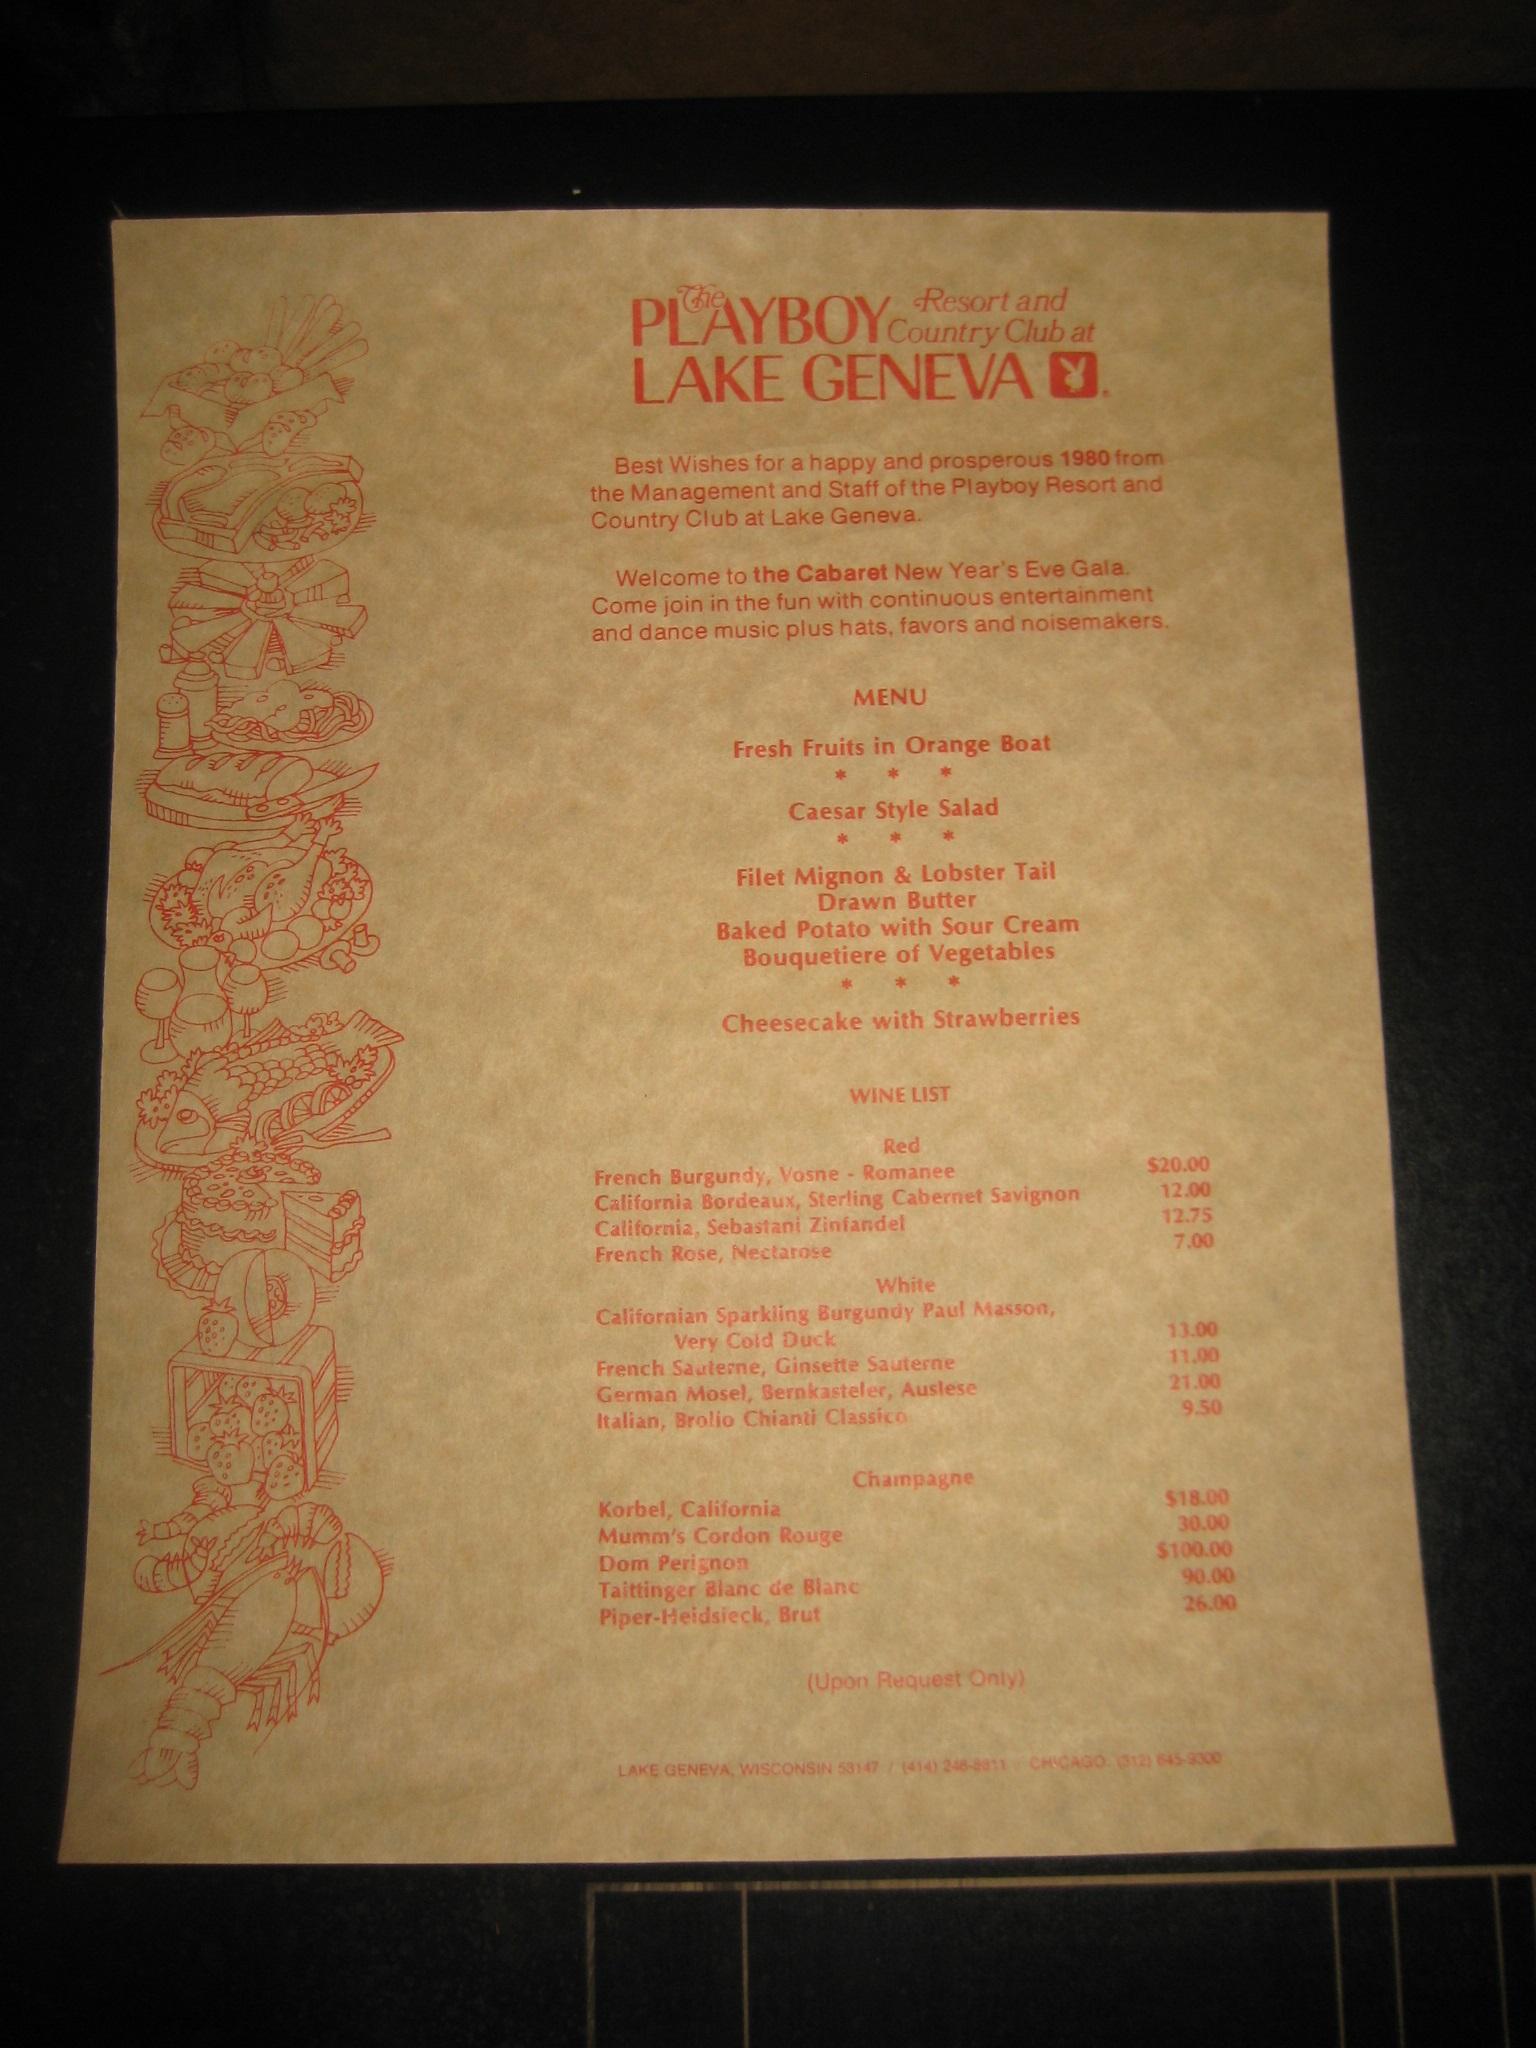 Playboy Club Lake Geneva New Years Eve Gala 1979 Menu